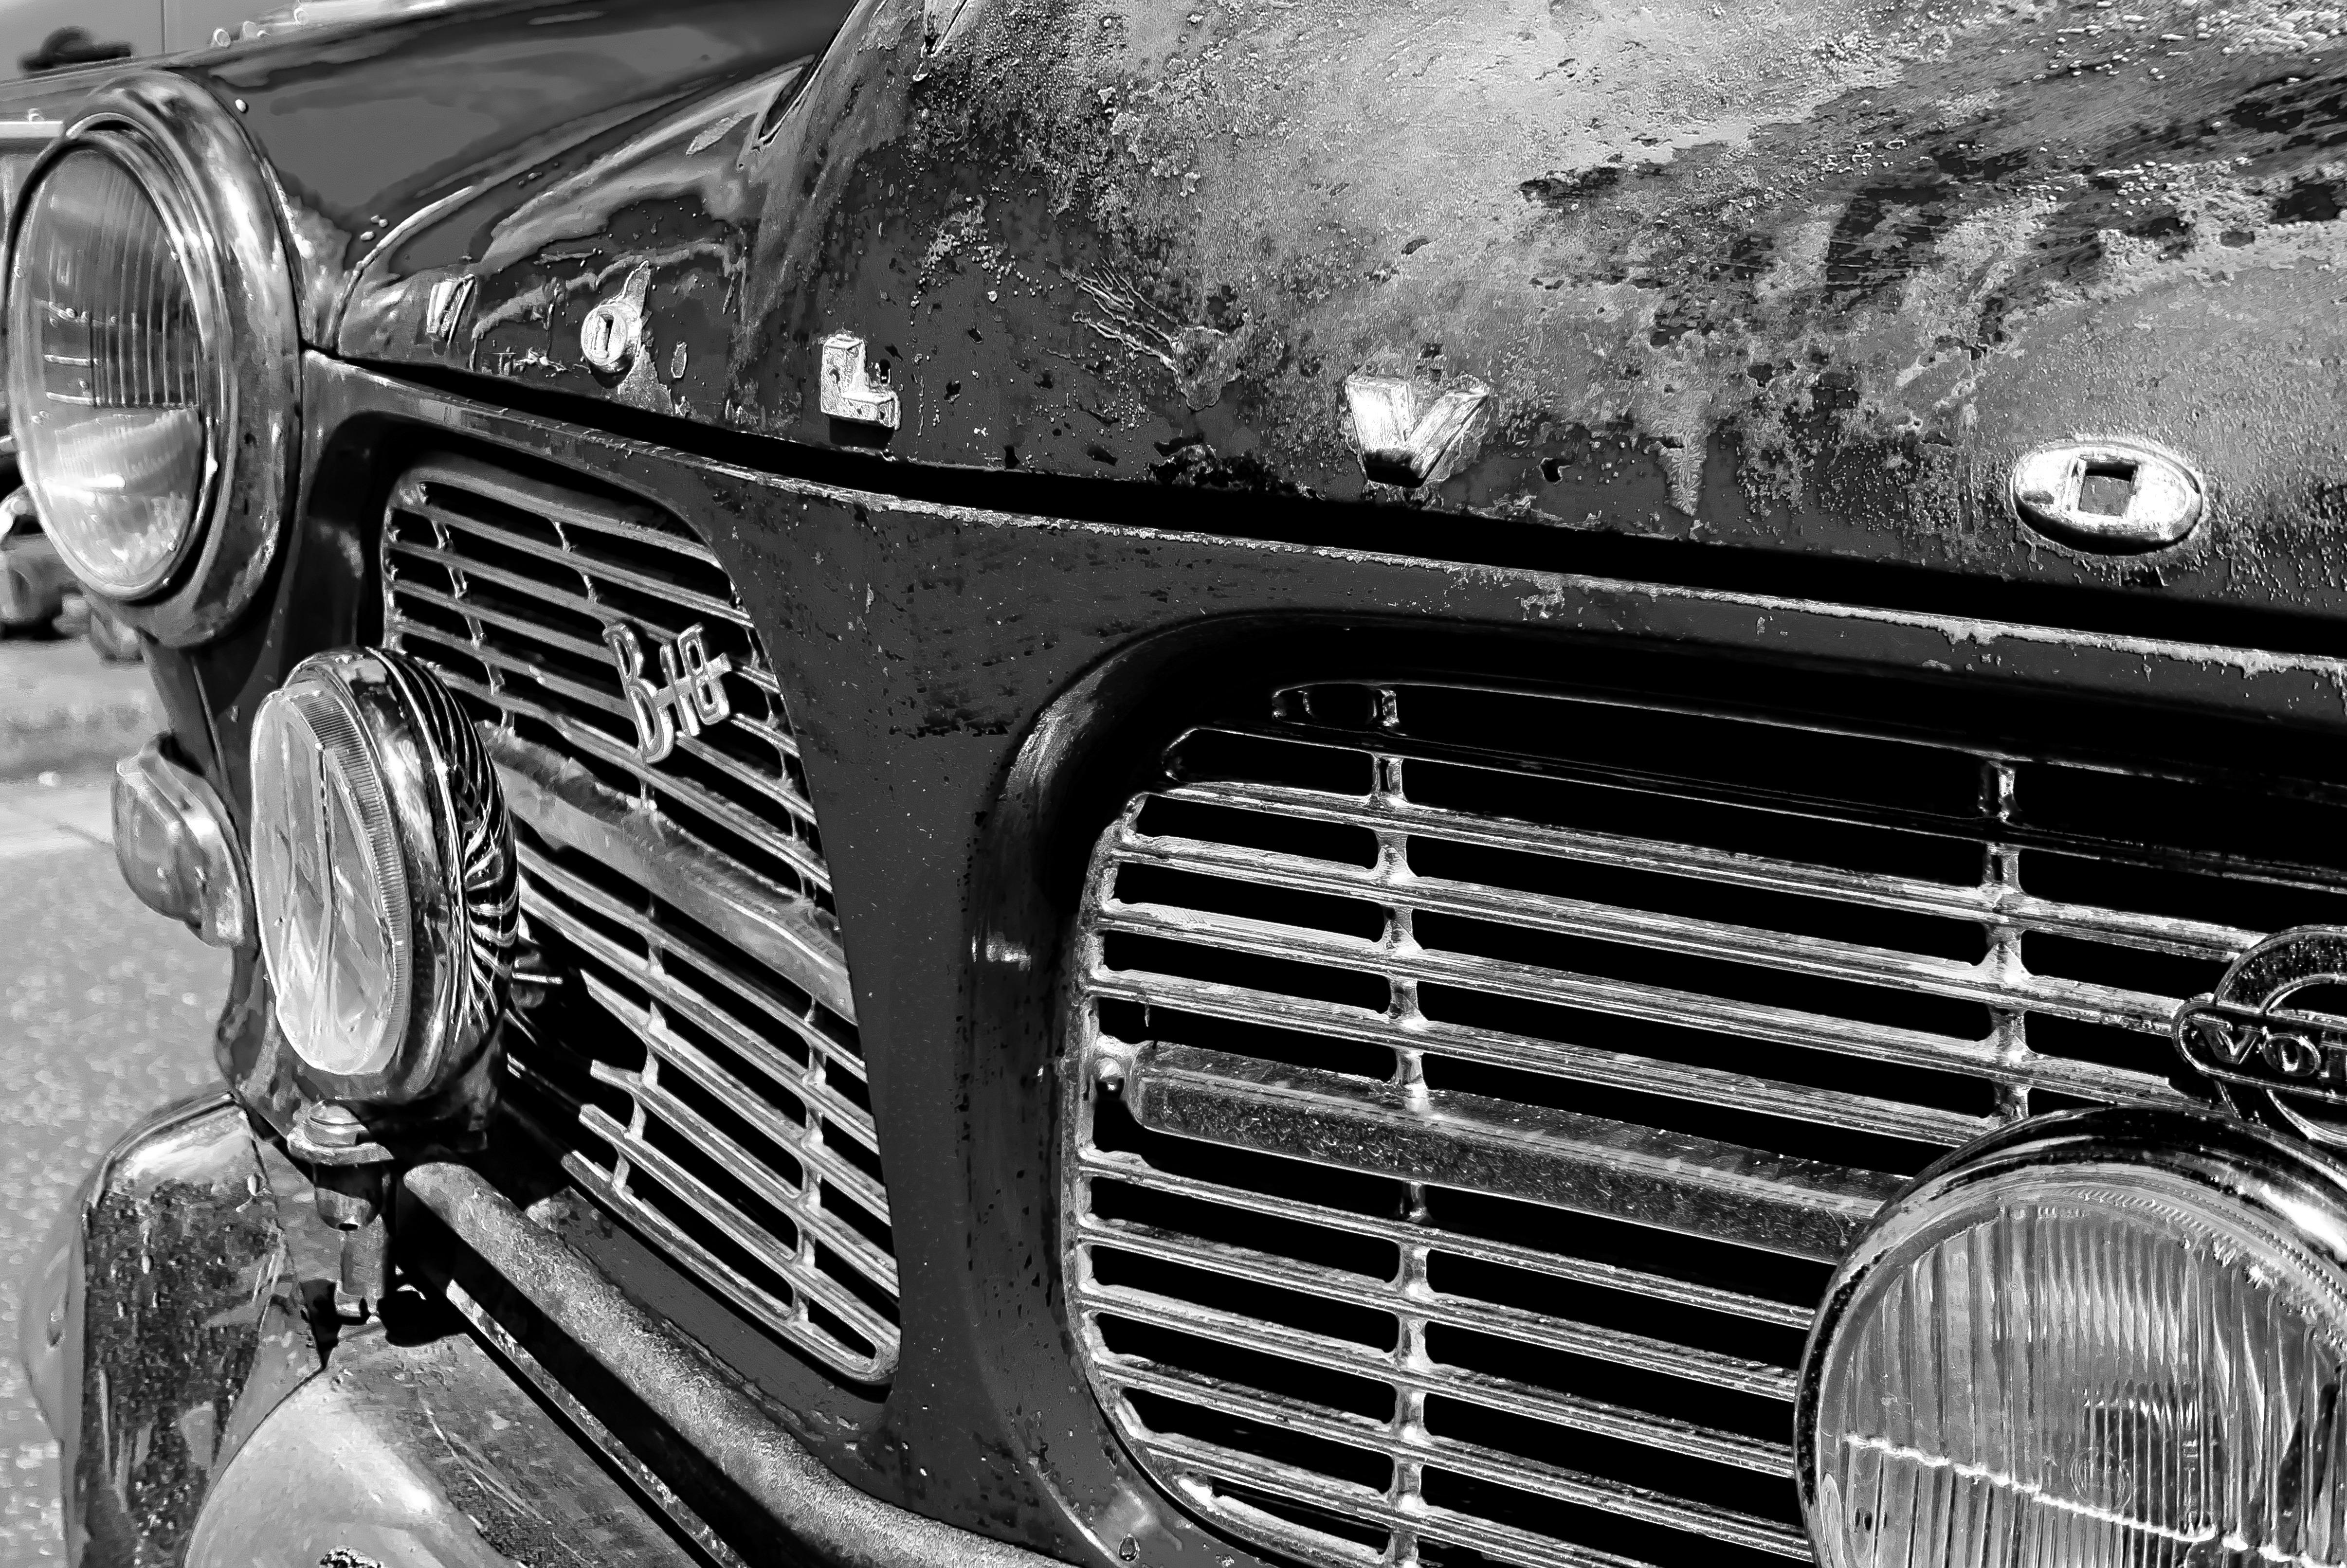 Free Images : black and white, wheel, old, motor vehicle, vintage ...